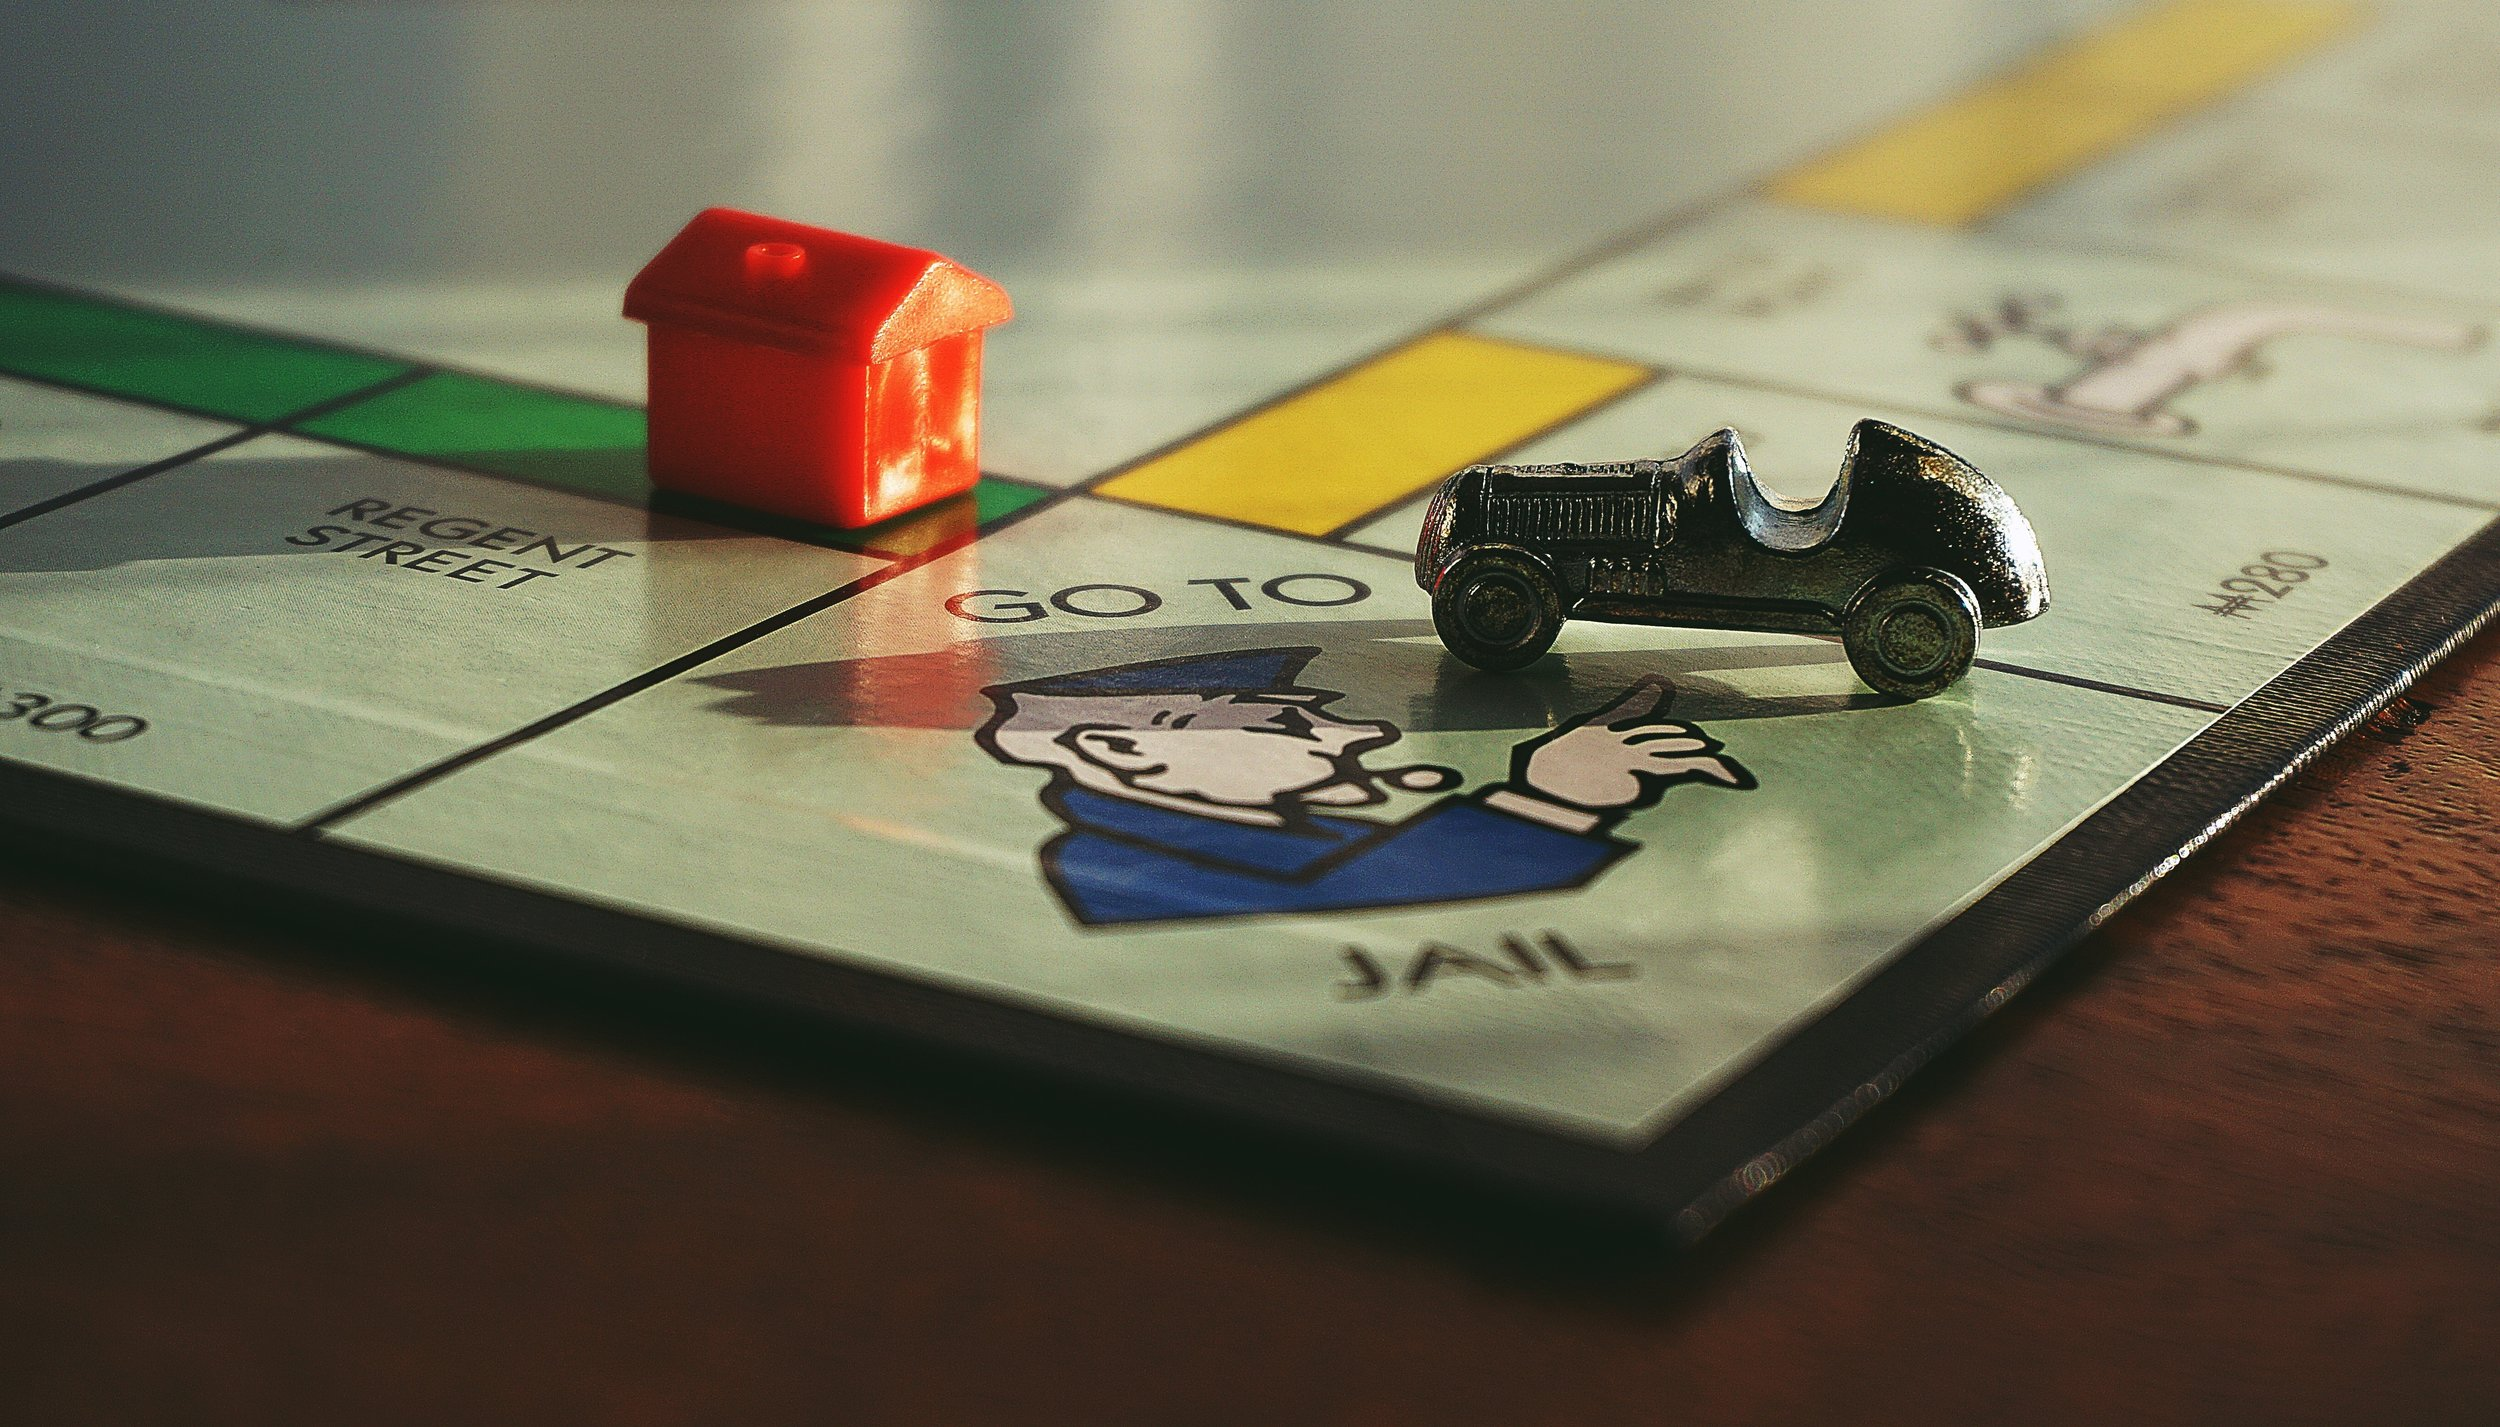 board-game-chance-close-up-1422673.jpg